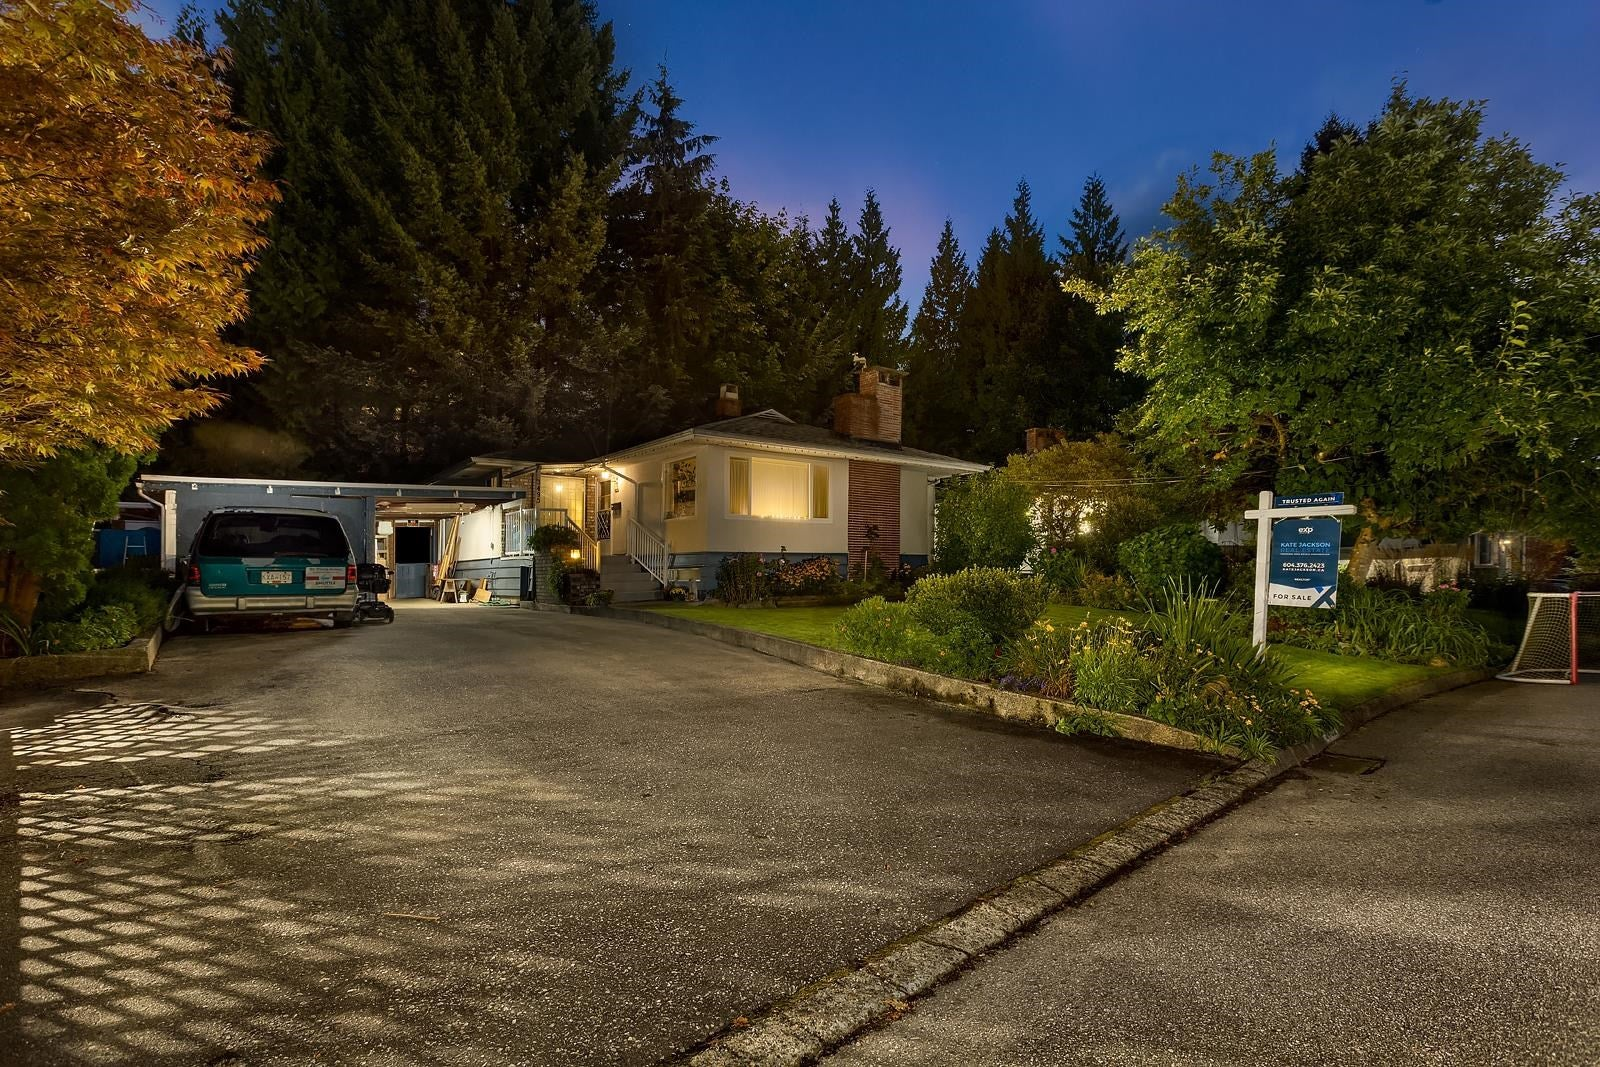 3495 WELLINGTON CRESCENT - Edgemont House/Single Family for sale, 3 Bedrooms (R2617949) - #19